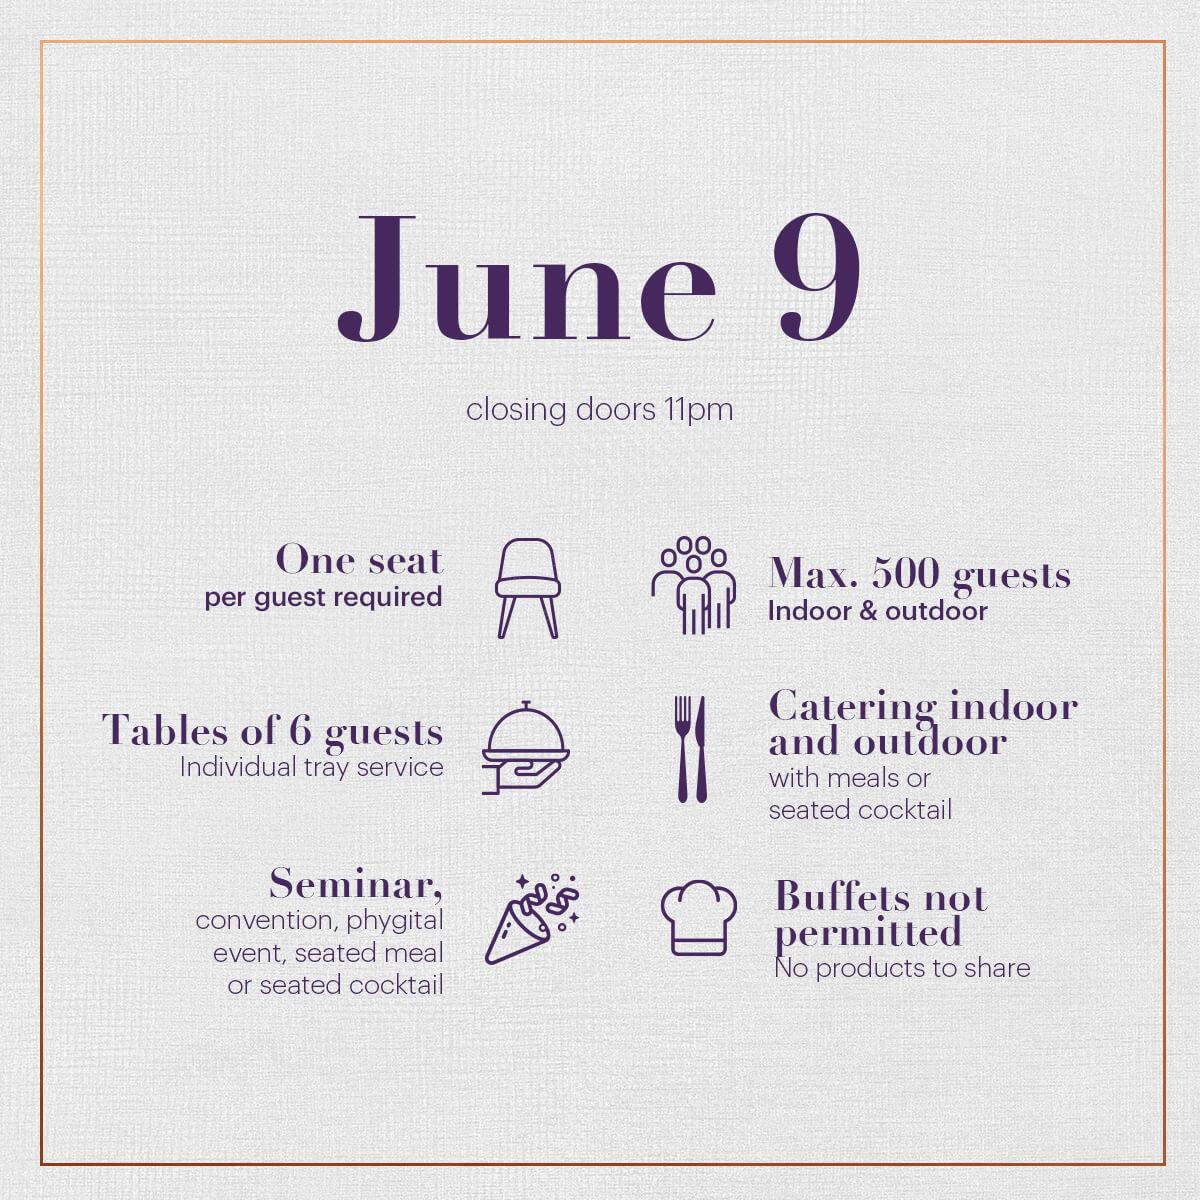 Health protocole - June 9